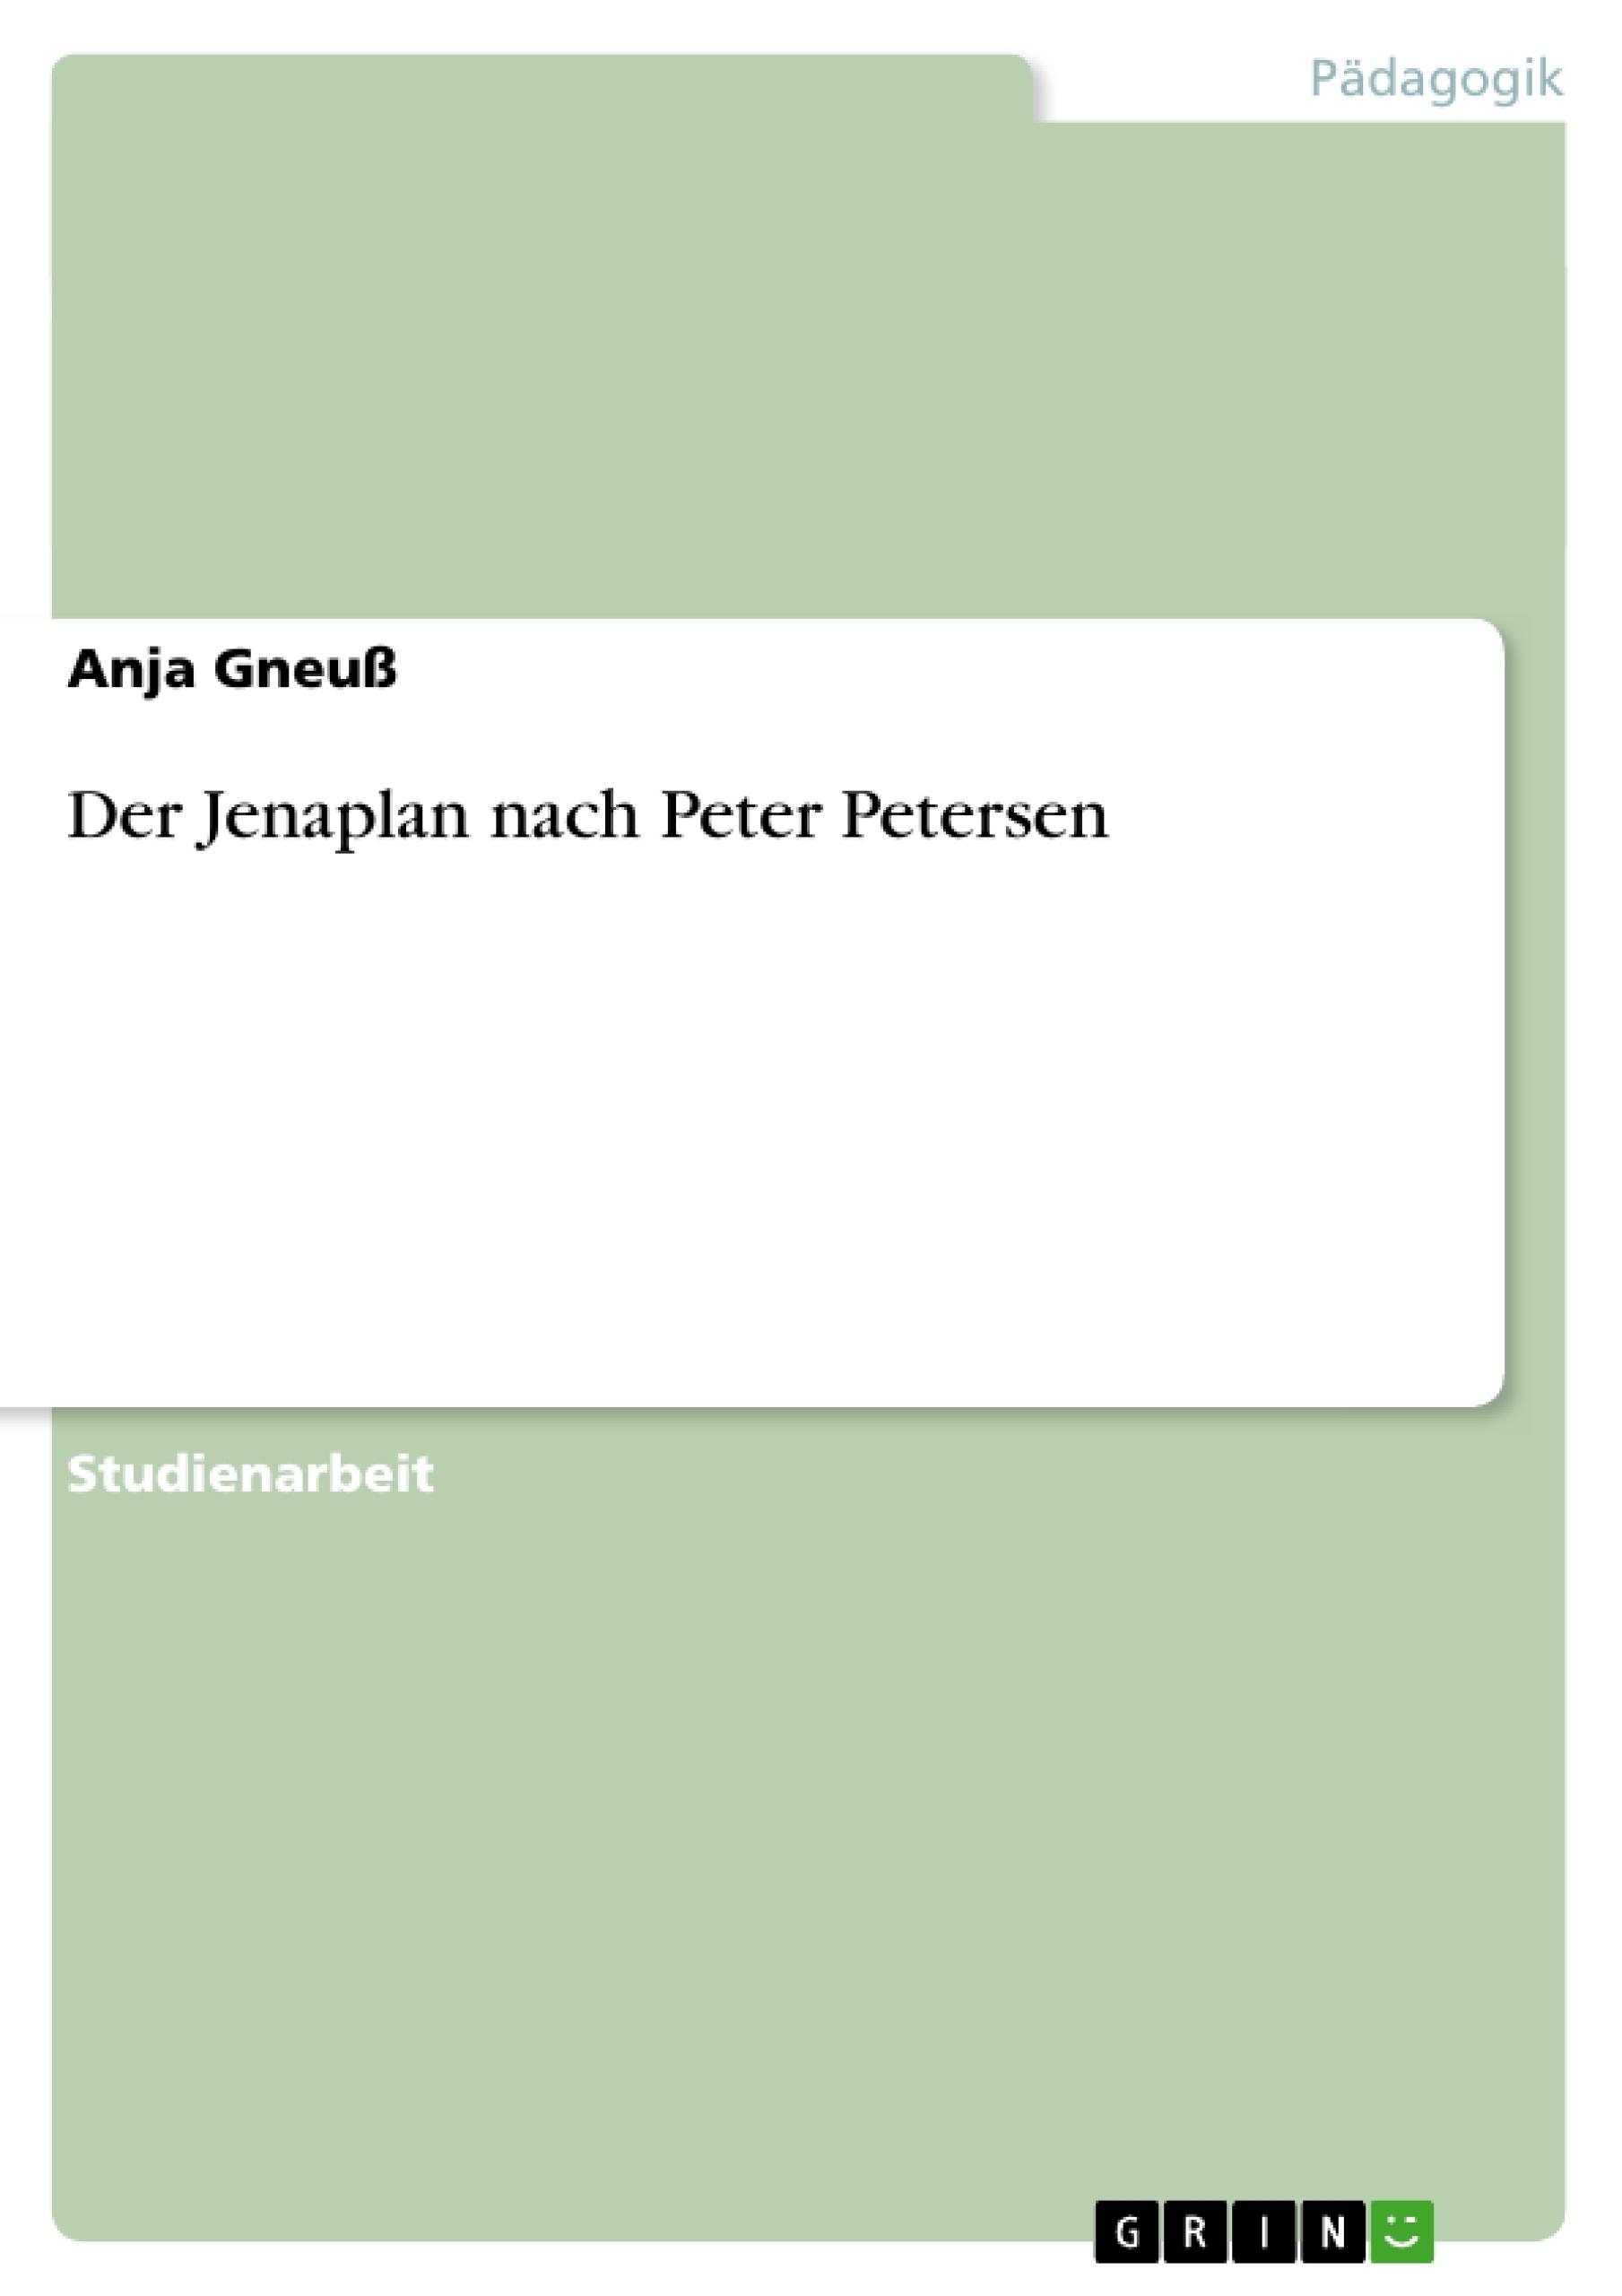 Titel: Der Jenaplan nach Peter Petersen